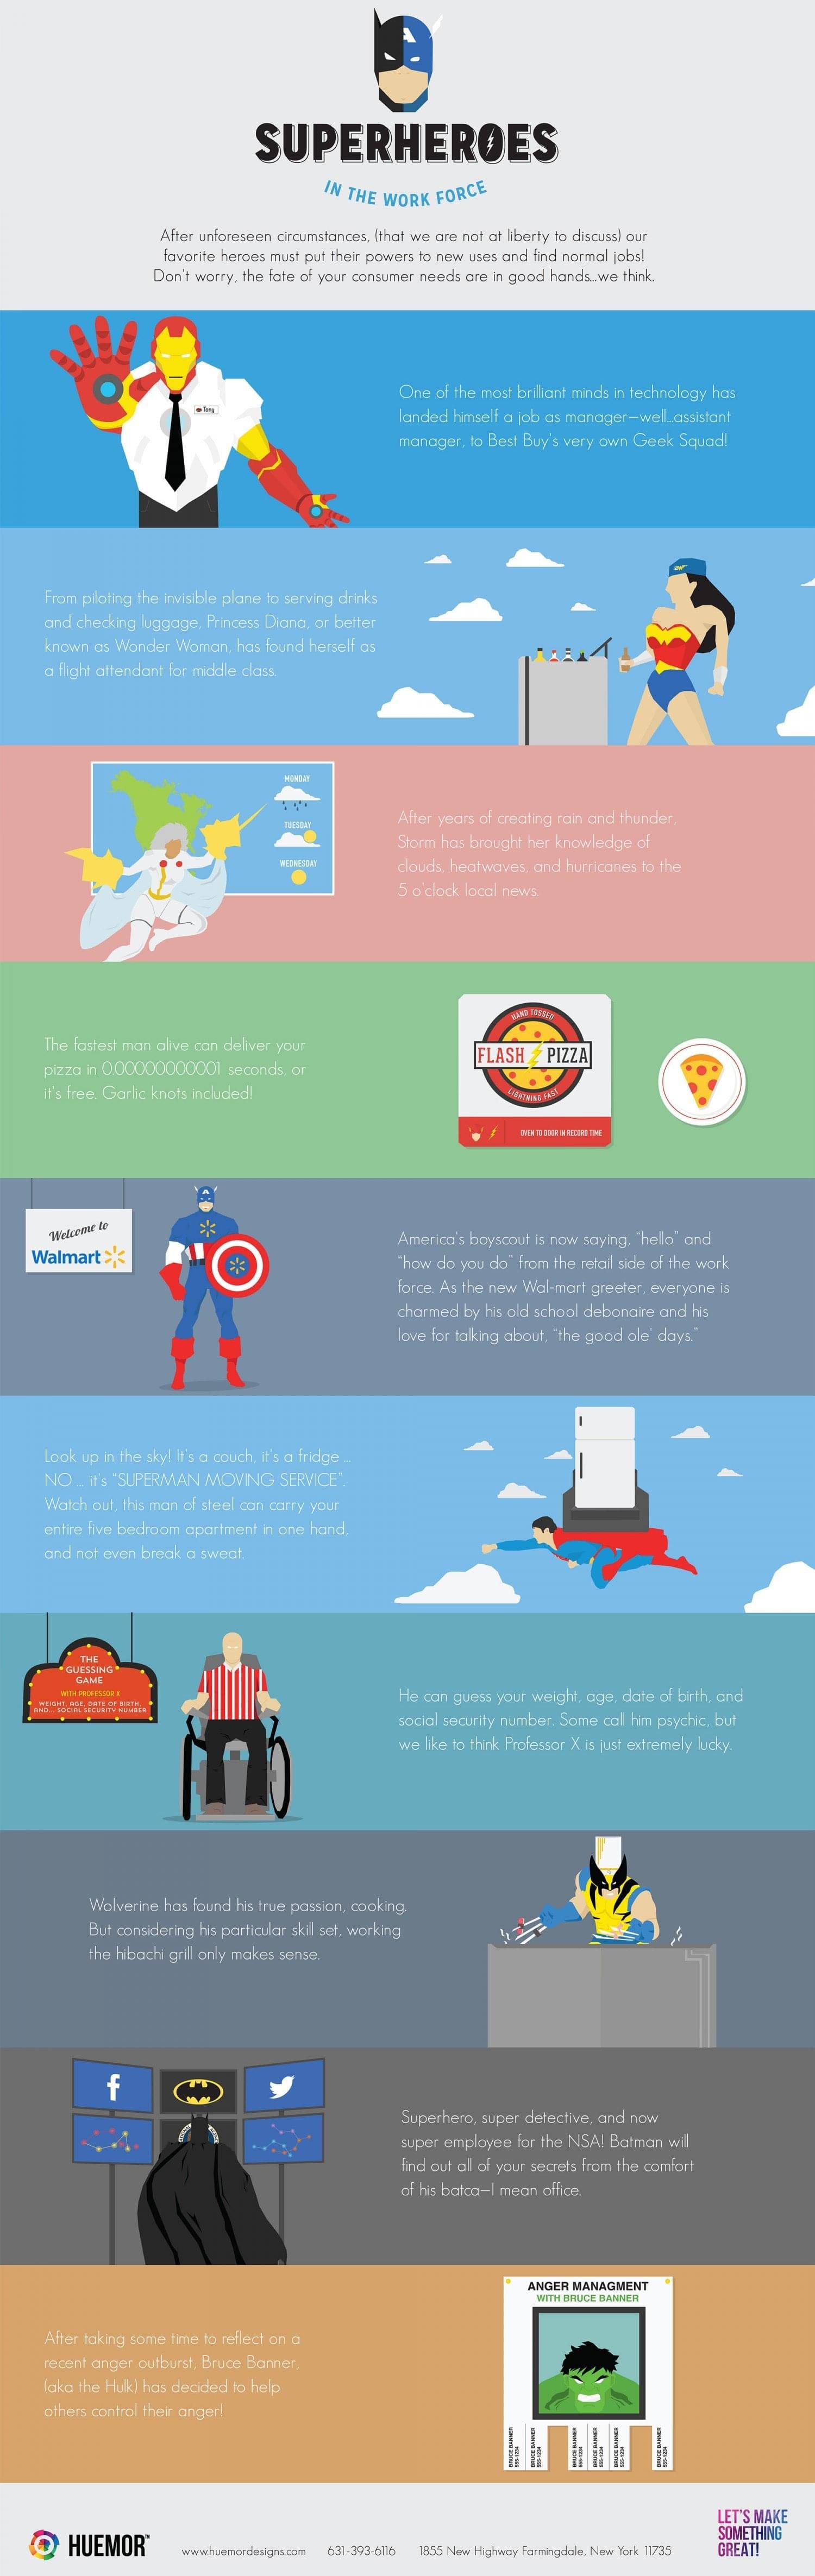 superhero jobs